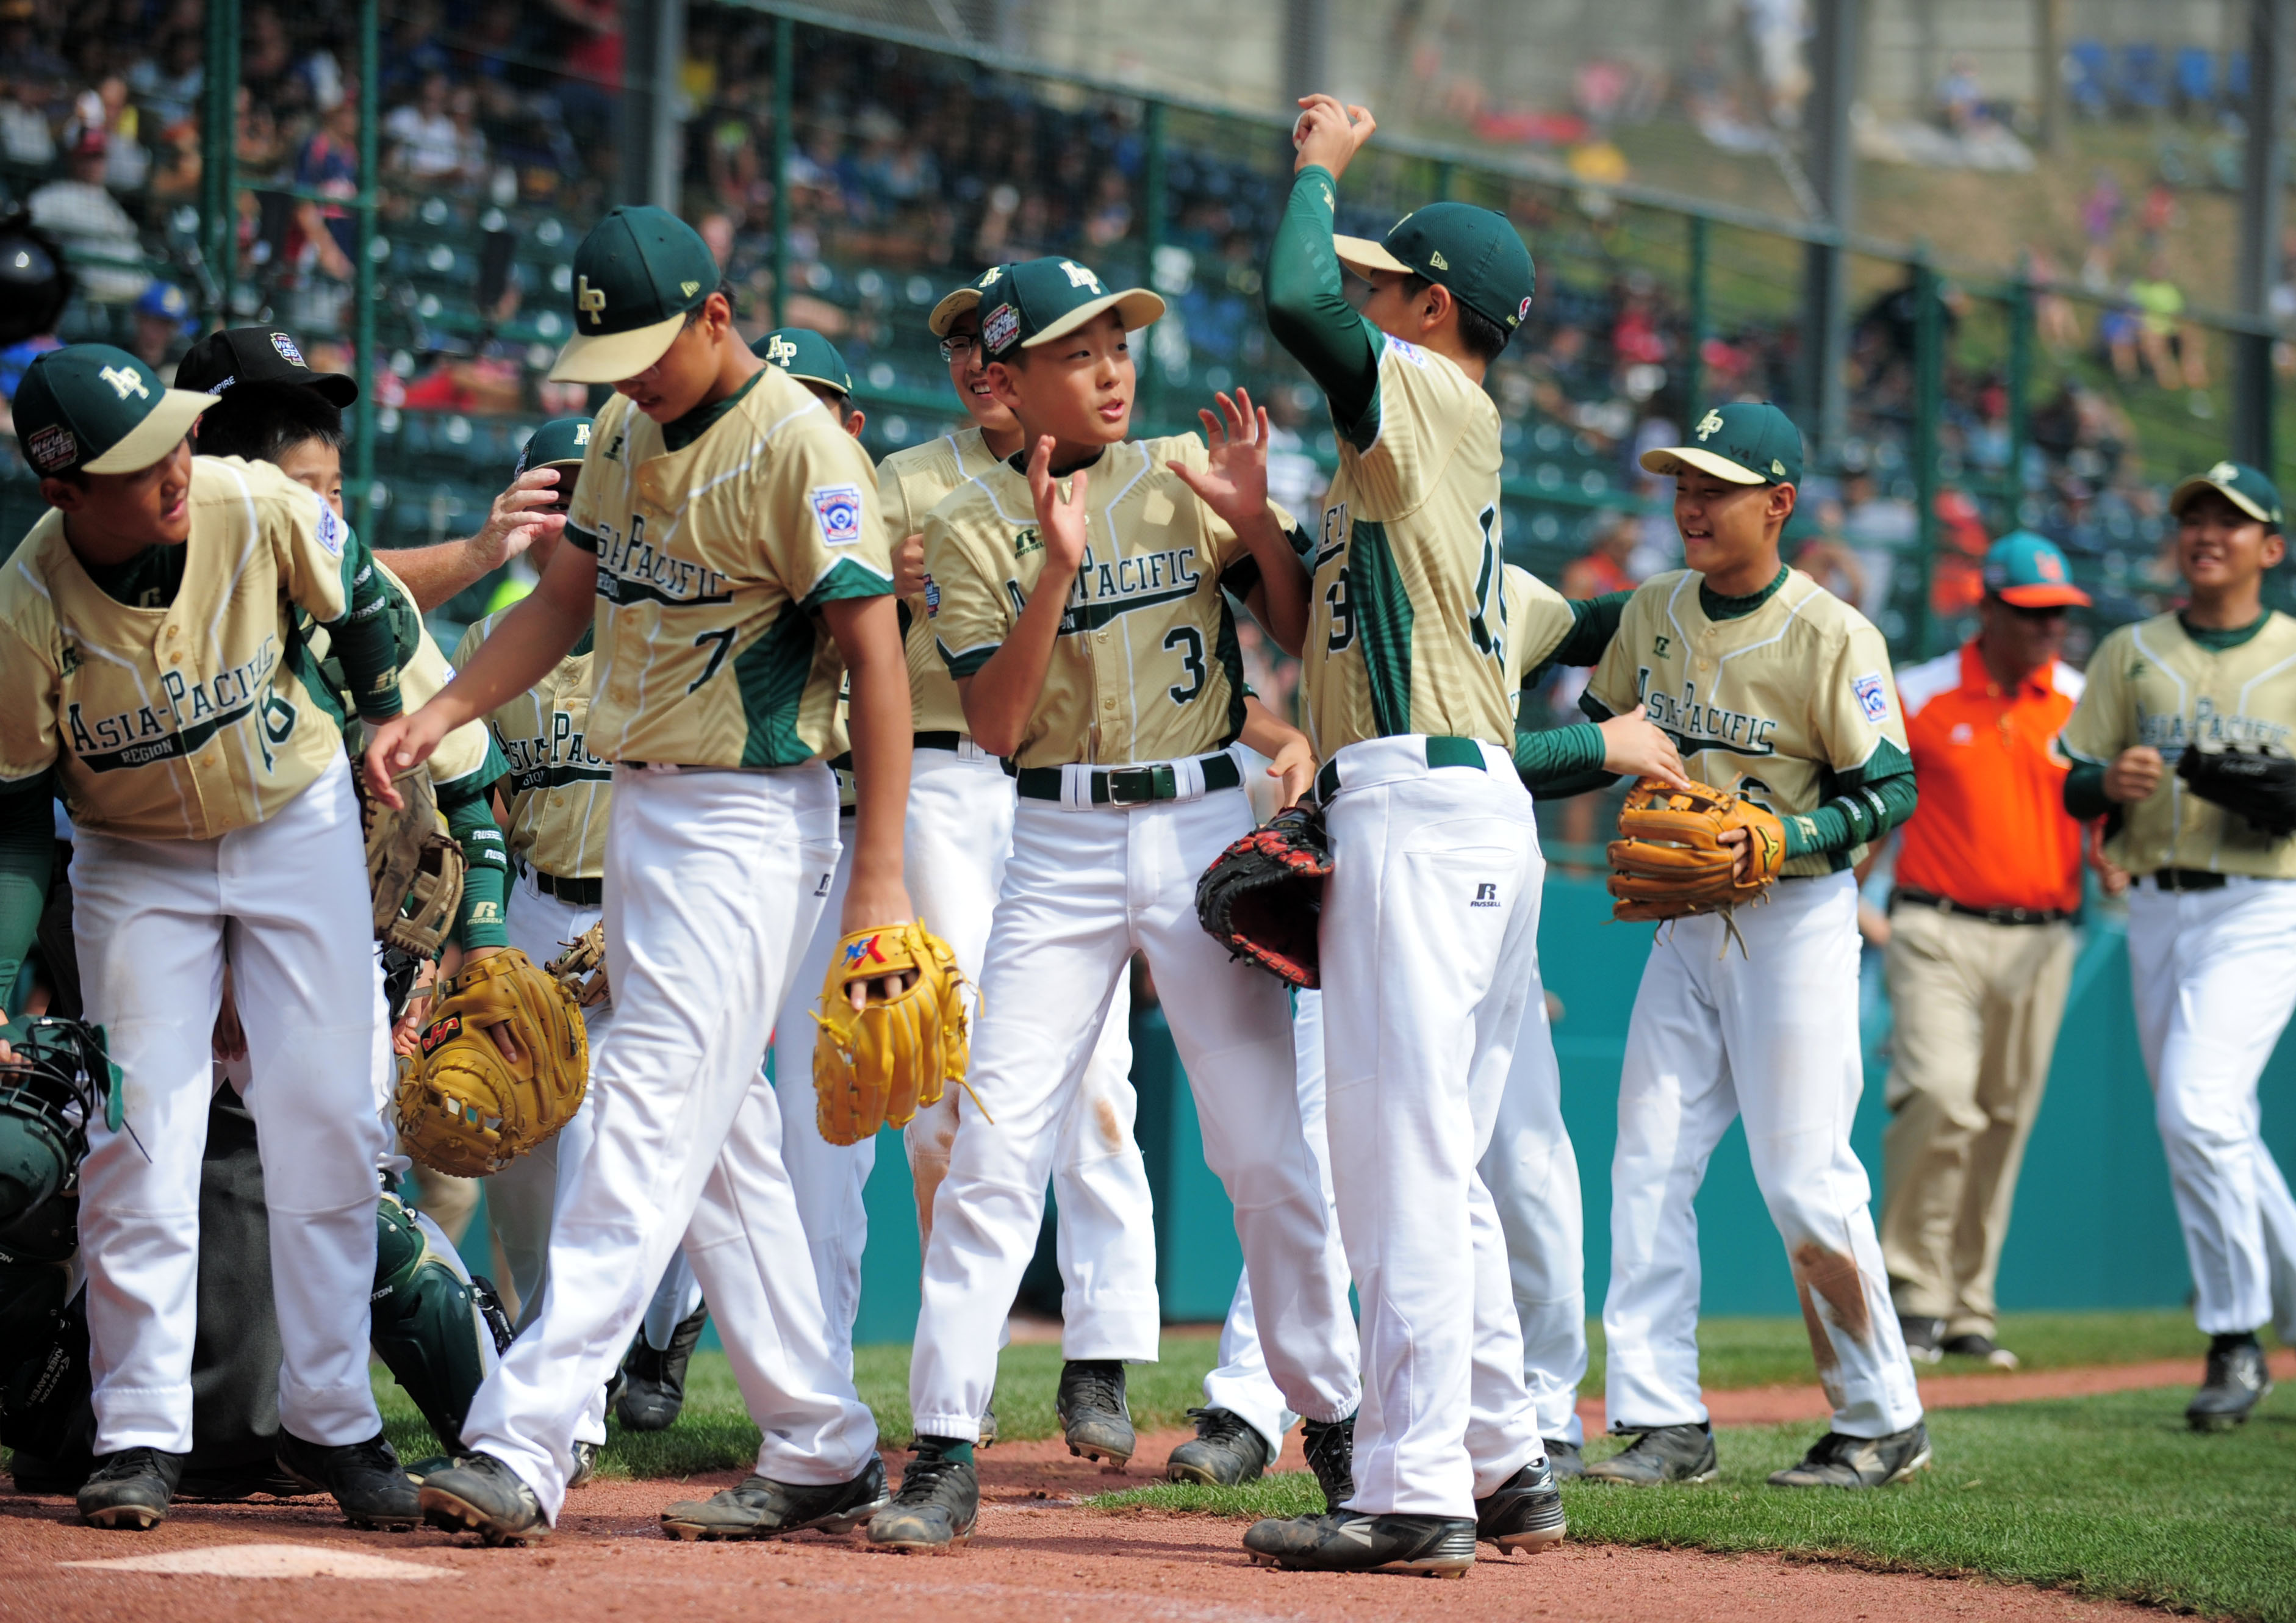 Baseball: Little League World Series-Asia-Pacific Region vs Latin America Region